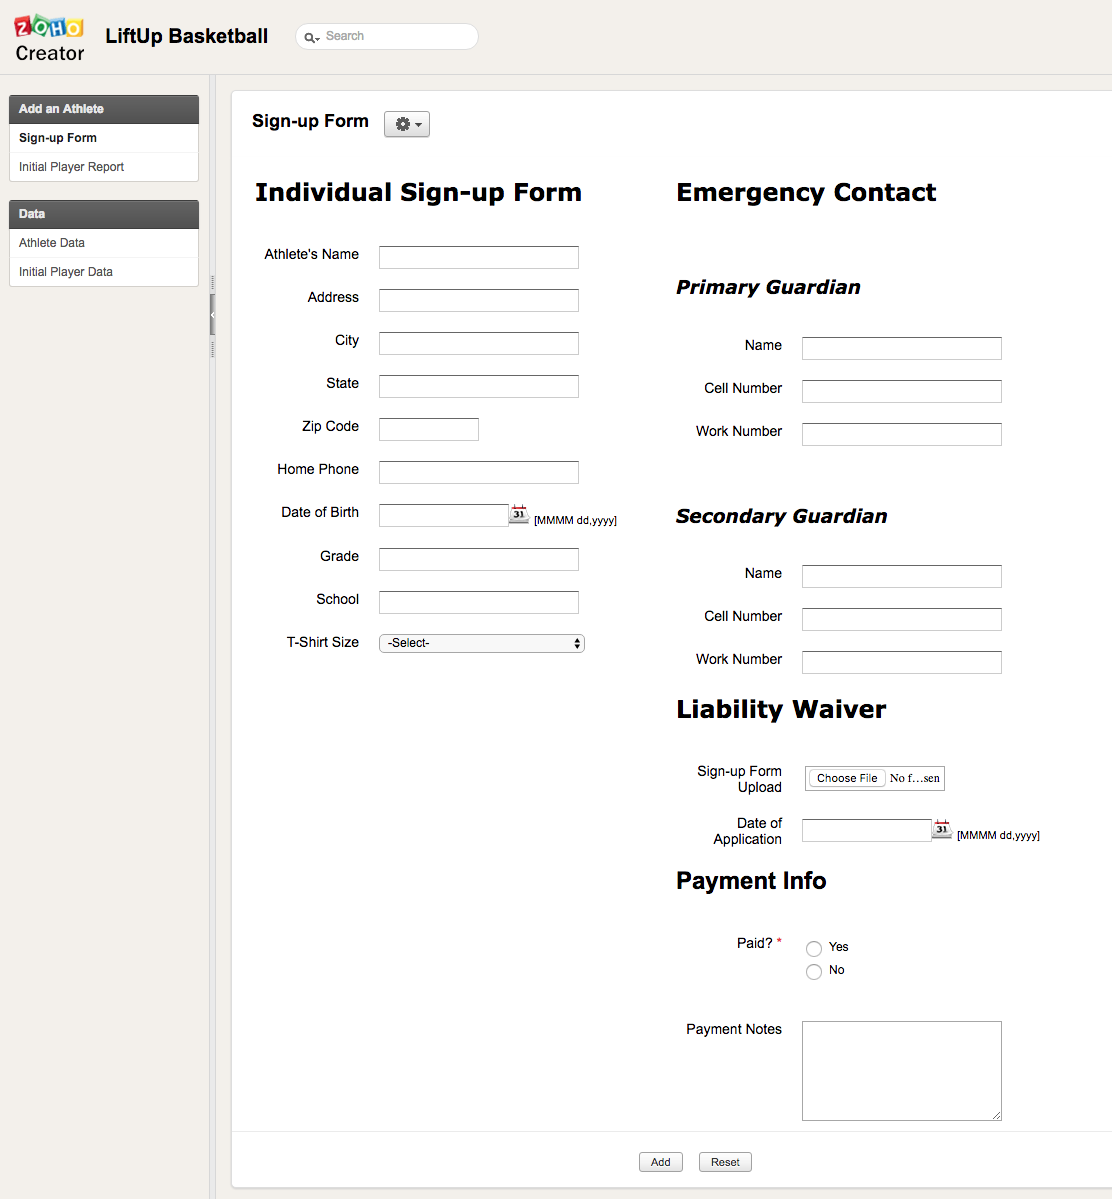 Zoho Creator player database